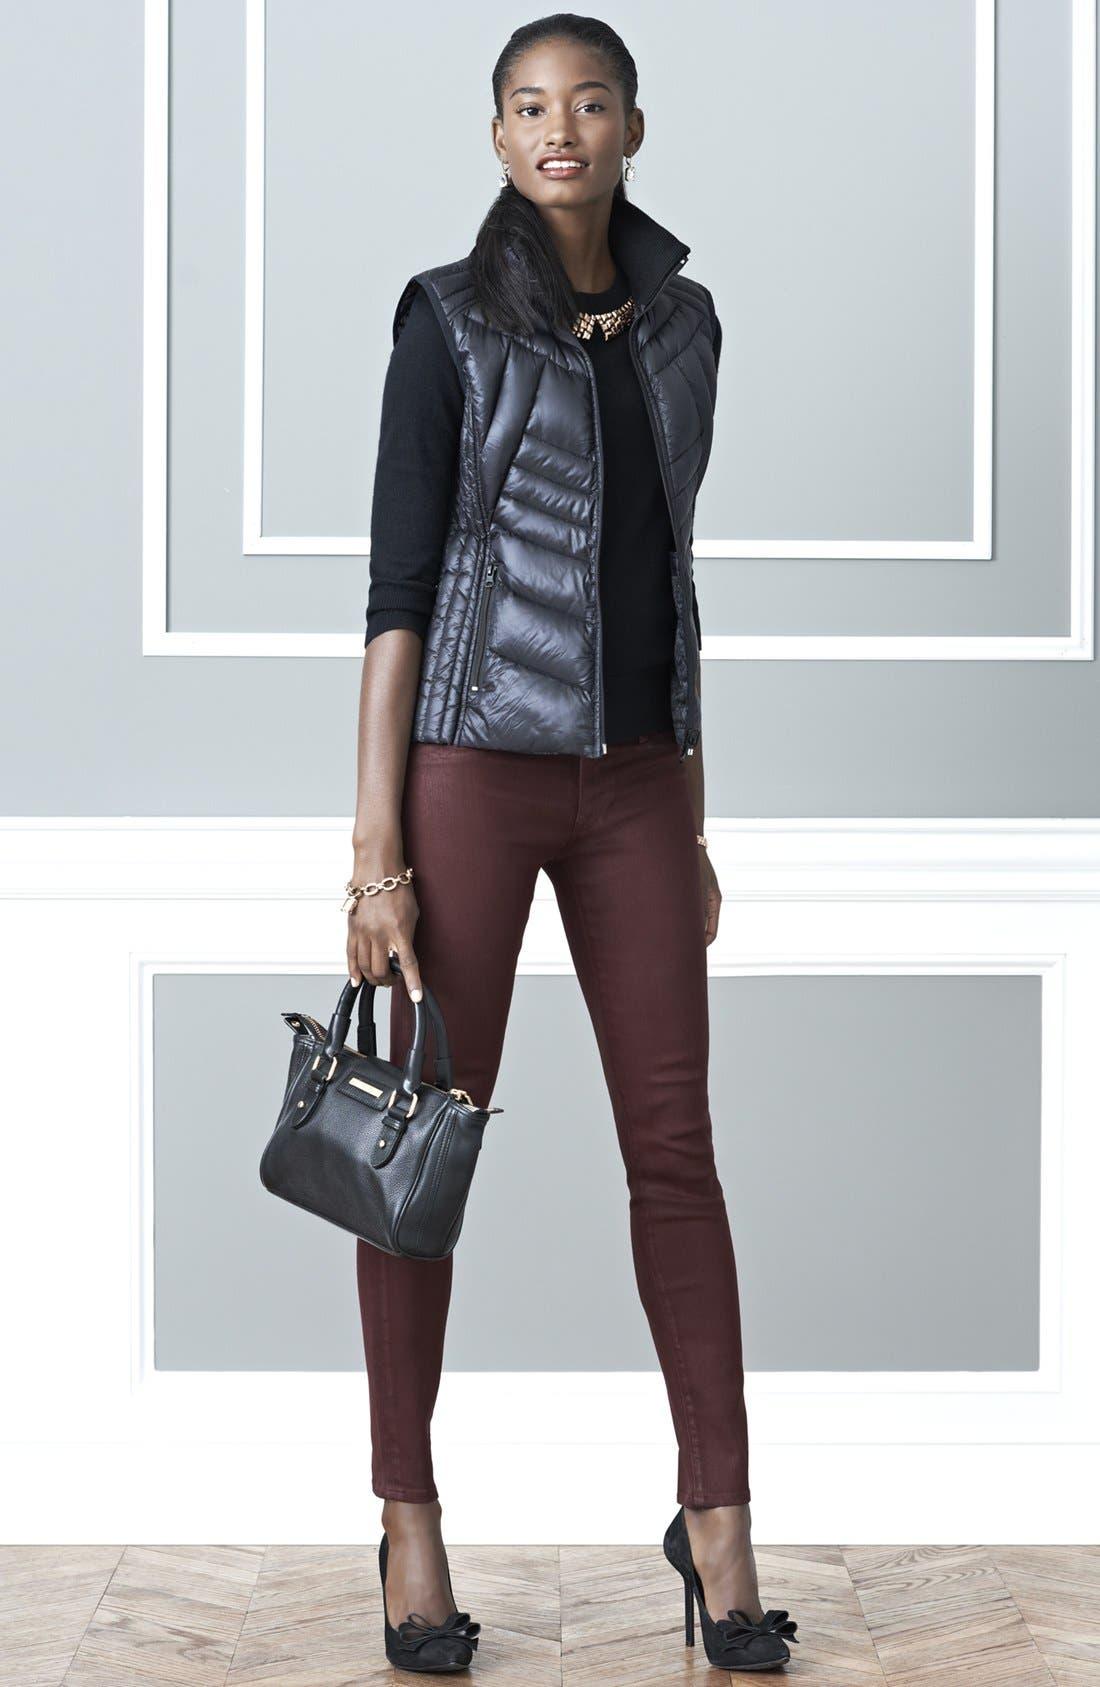 Alternate Image 1 Selected - Bernardo Goose Down Vest, kate spade new york sweater & Hudson Jeans Super Skinny Jeans